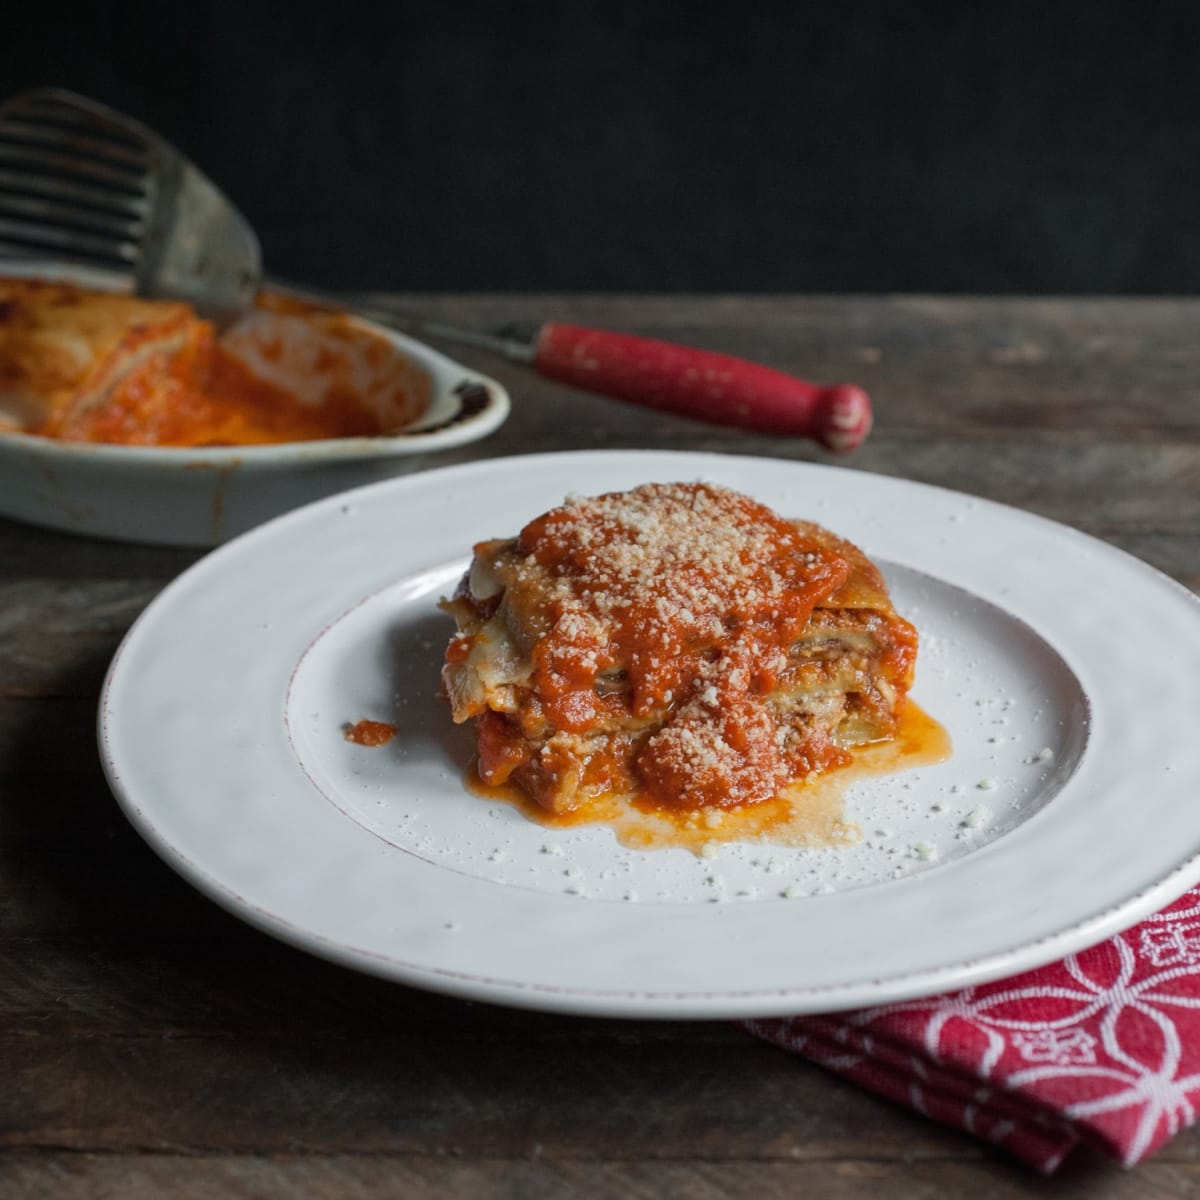 Paulie's cookbook eggplant parmesan